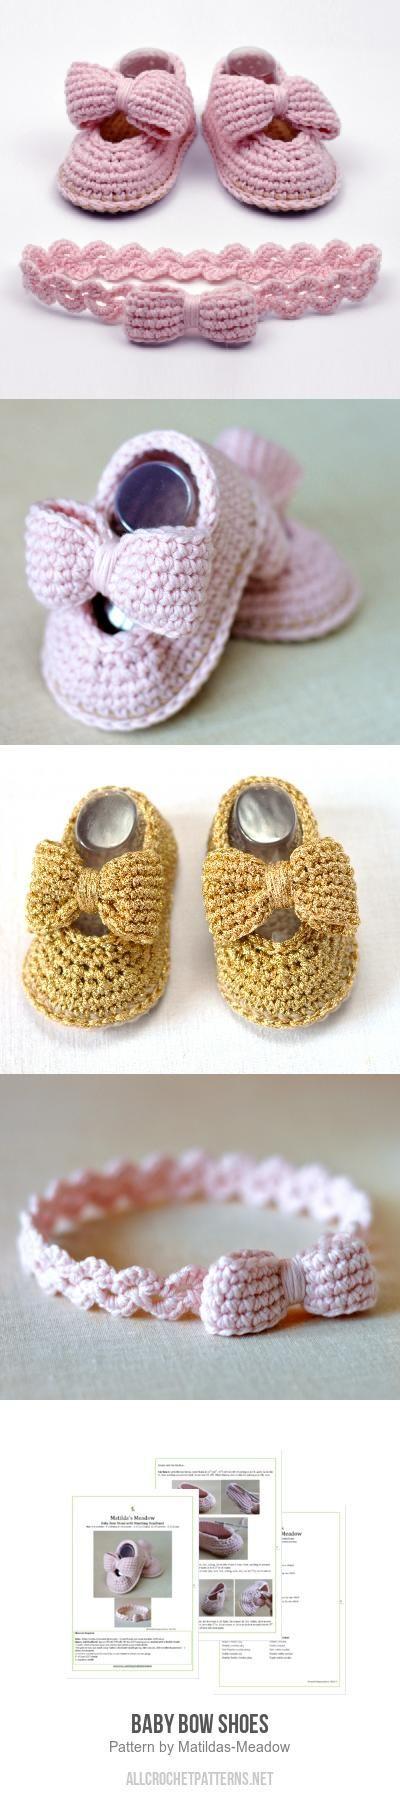 Baby Bow Shoes Crochet Pattern | Patrones de ganchillo | Pinterest ...